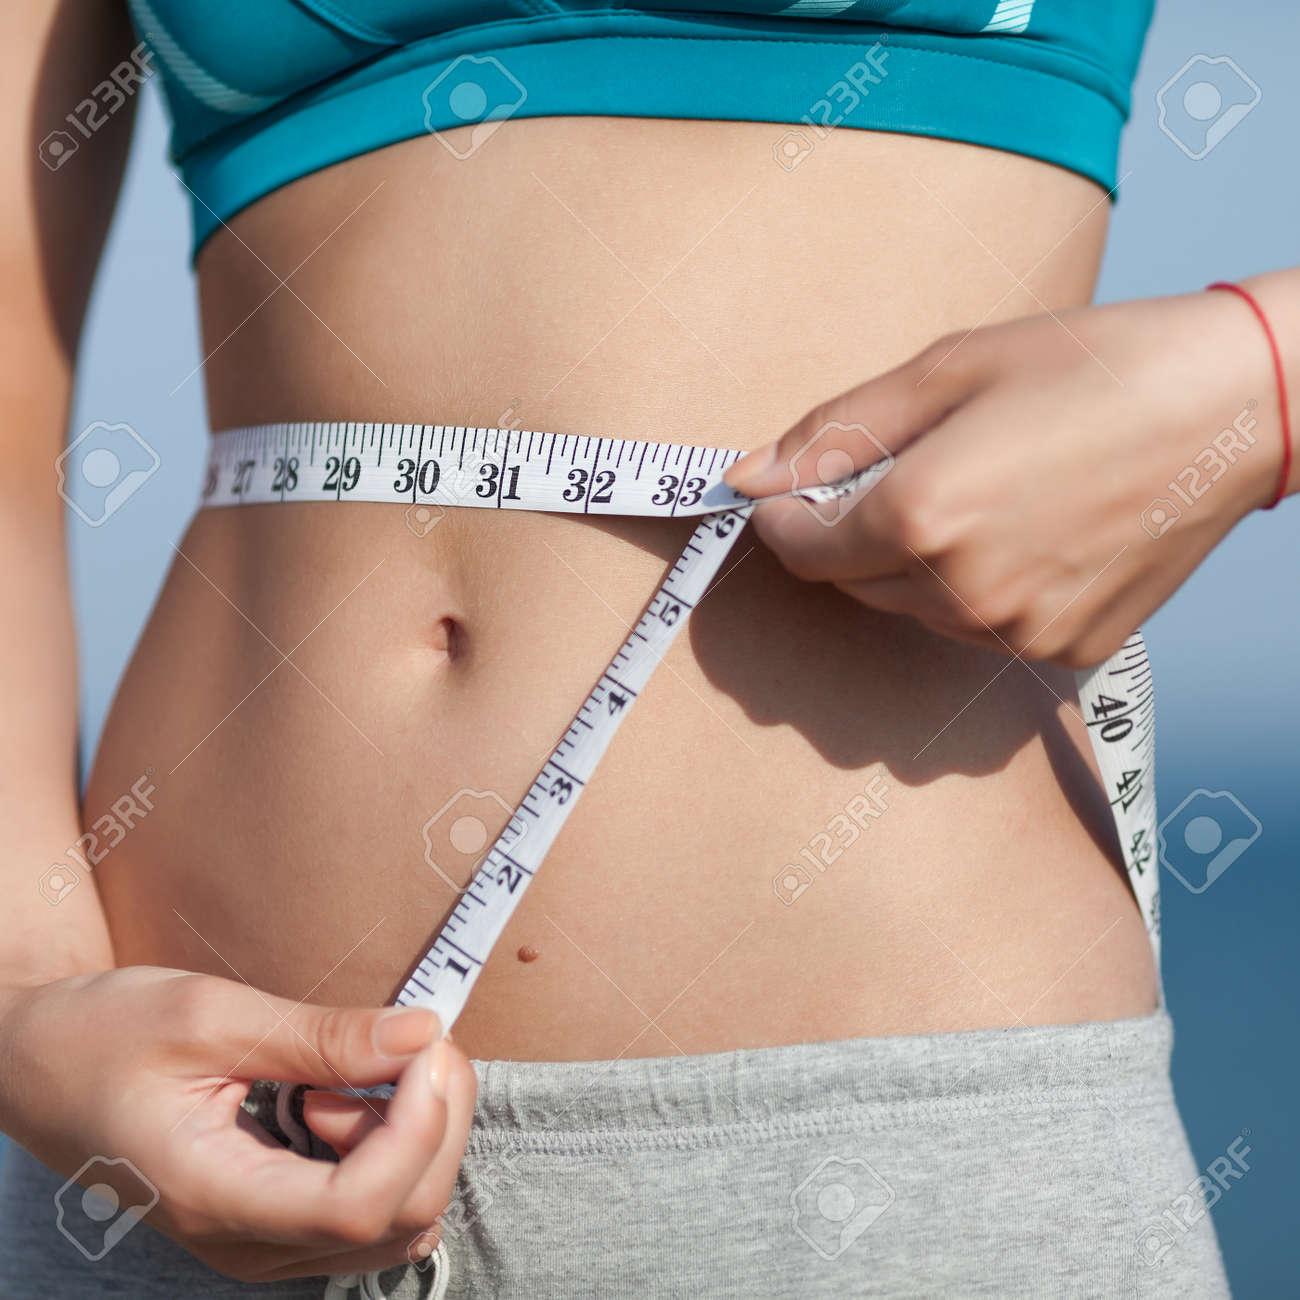 Sexy girl tummy